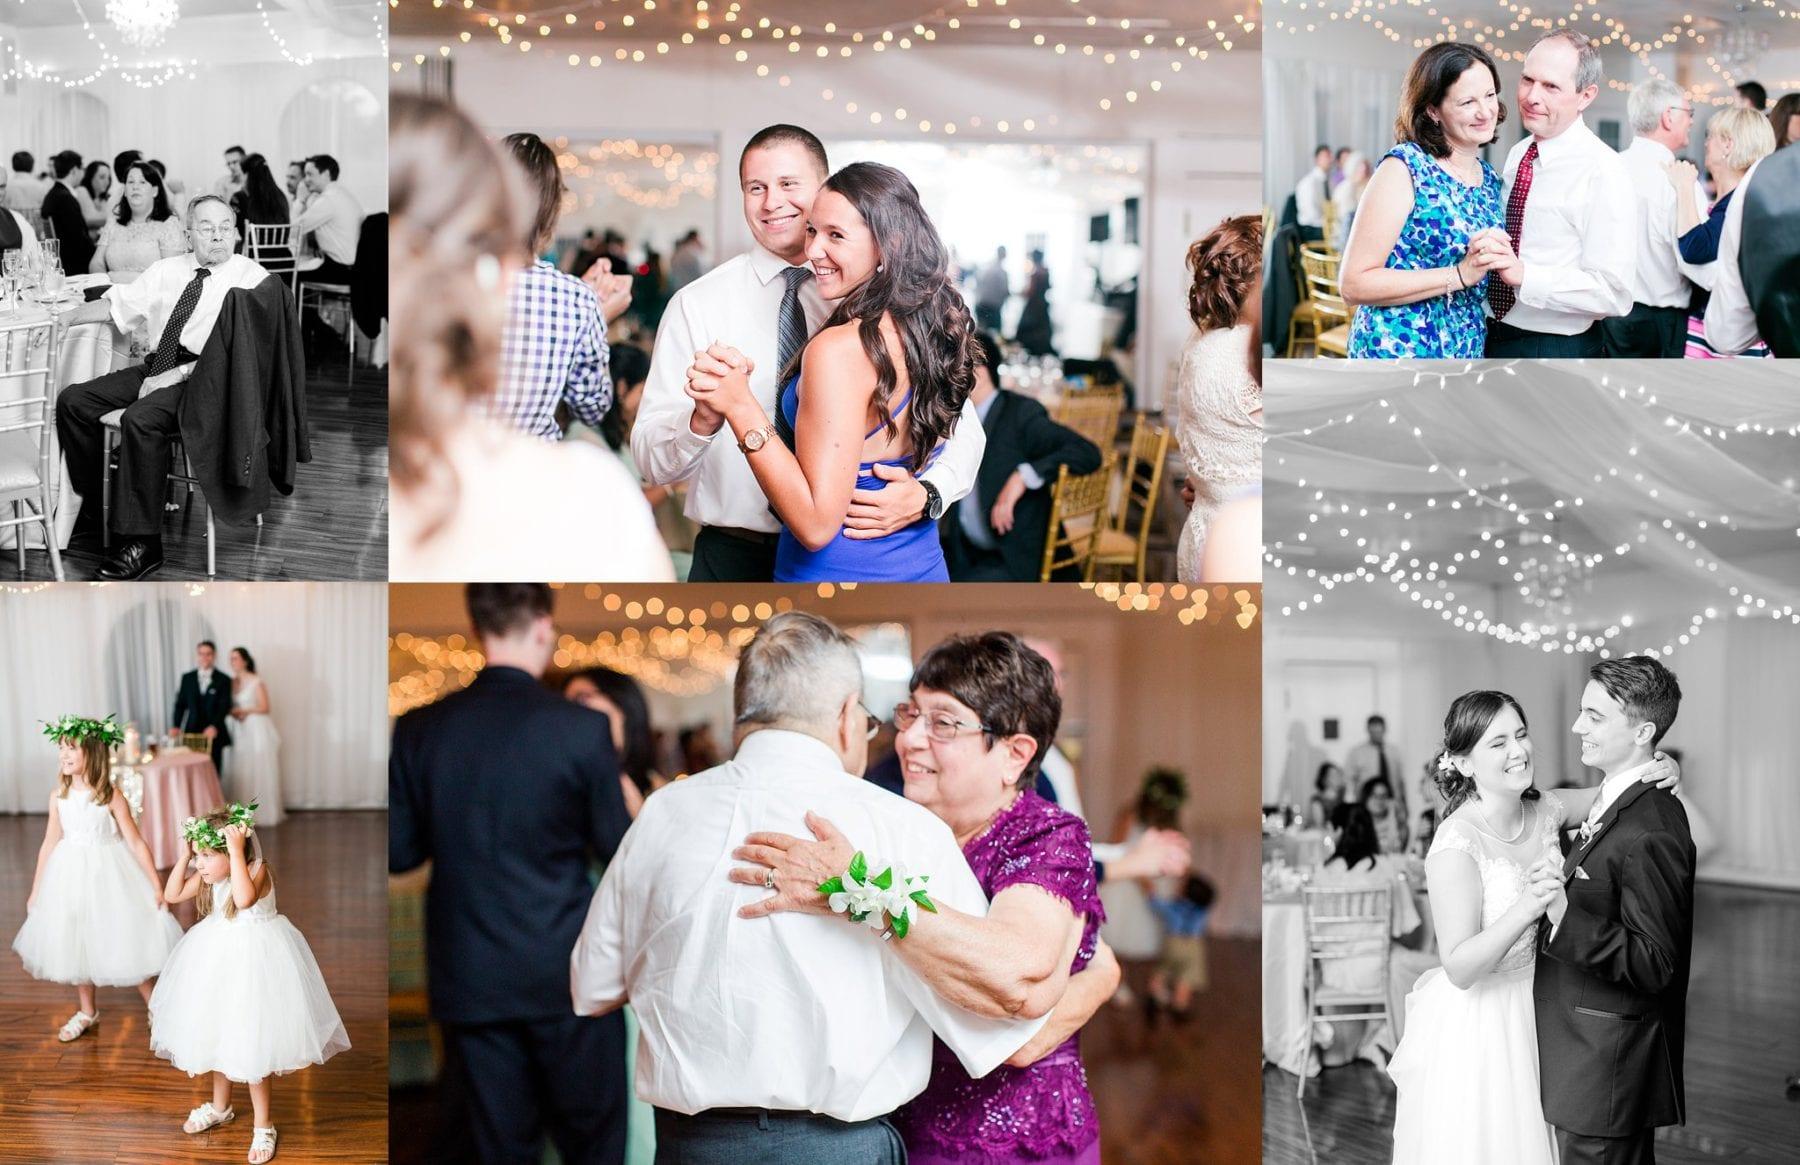 Bristow Manor Wedding Photos Virginia Wedding Photographer Lauren & Andrew Megan Kelsey Photography-727.jpg